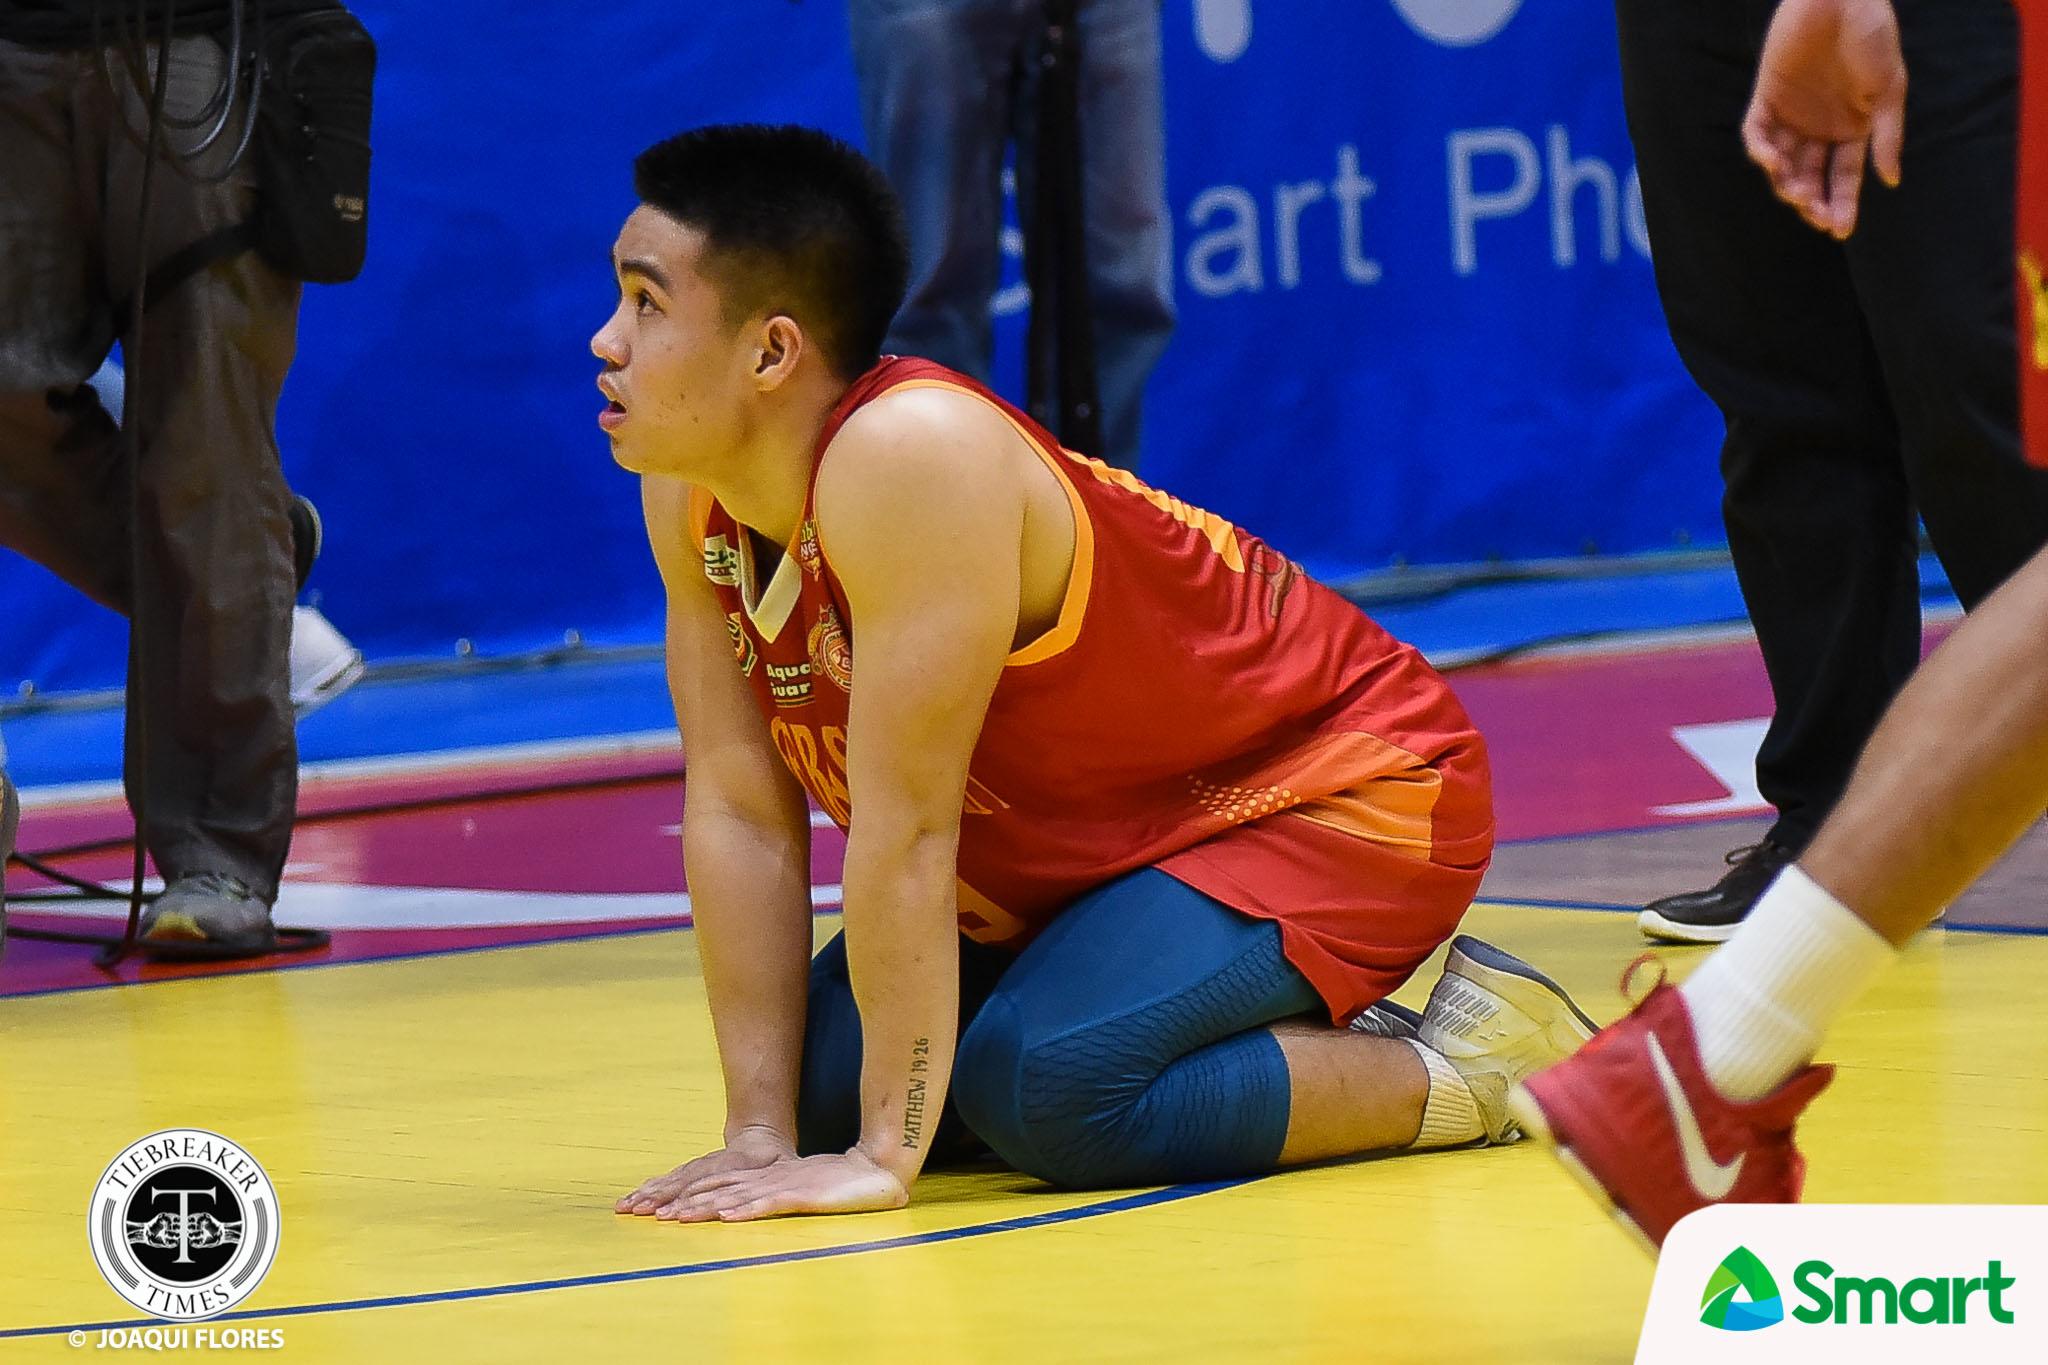 NCAA-94-SSCR-vs.-CSB-Ilagan-4196 Egay Macaraya on Benilde's possible protest: 'Okay lang sa amin' Basketball NCAA News SSC-R  - philippine sports news